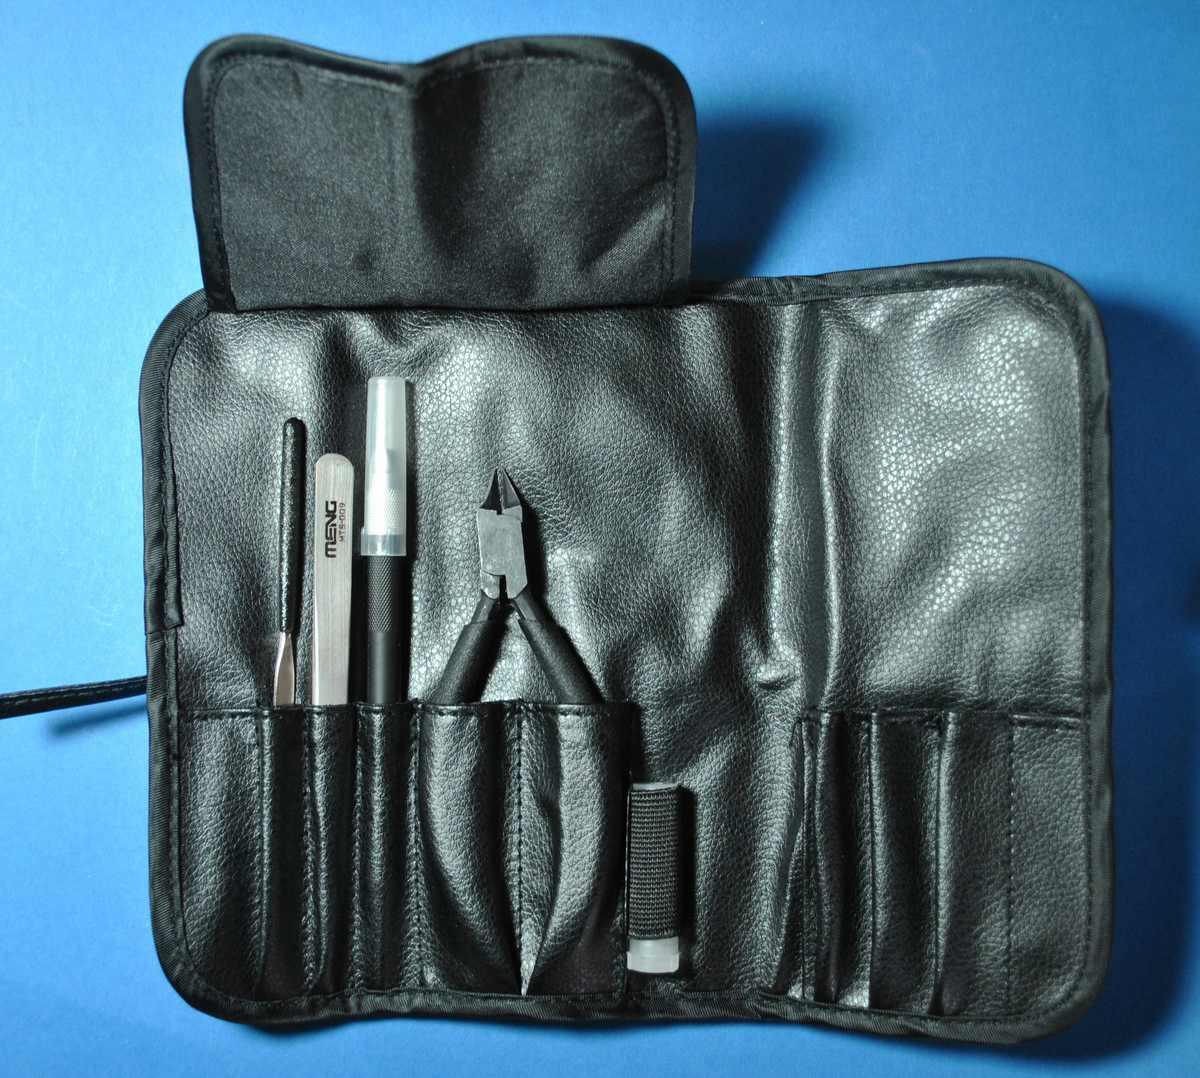 MENG-Werkzeug-9 Basic Hobby Tool von MENG